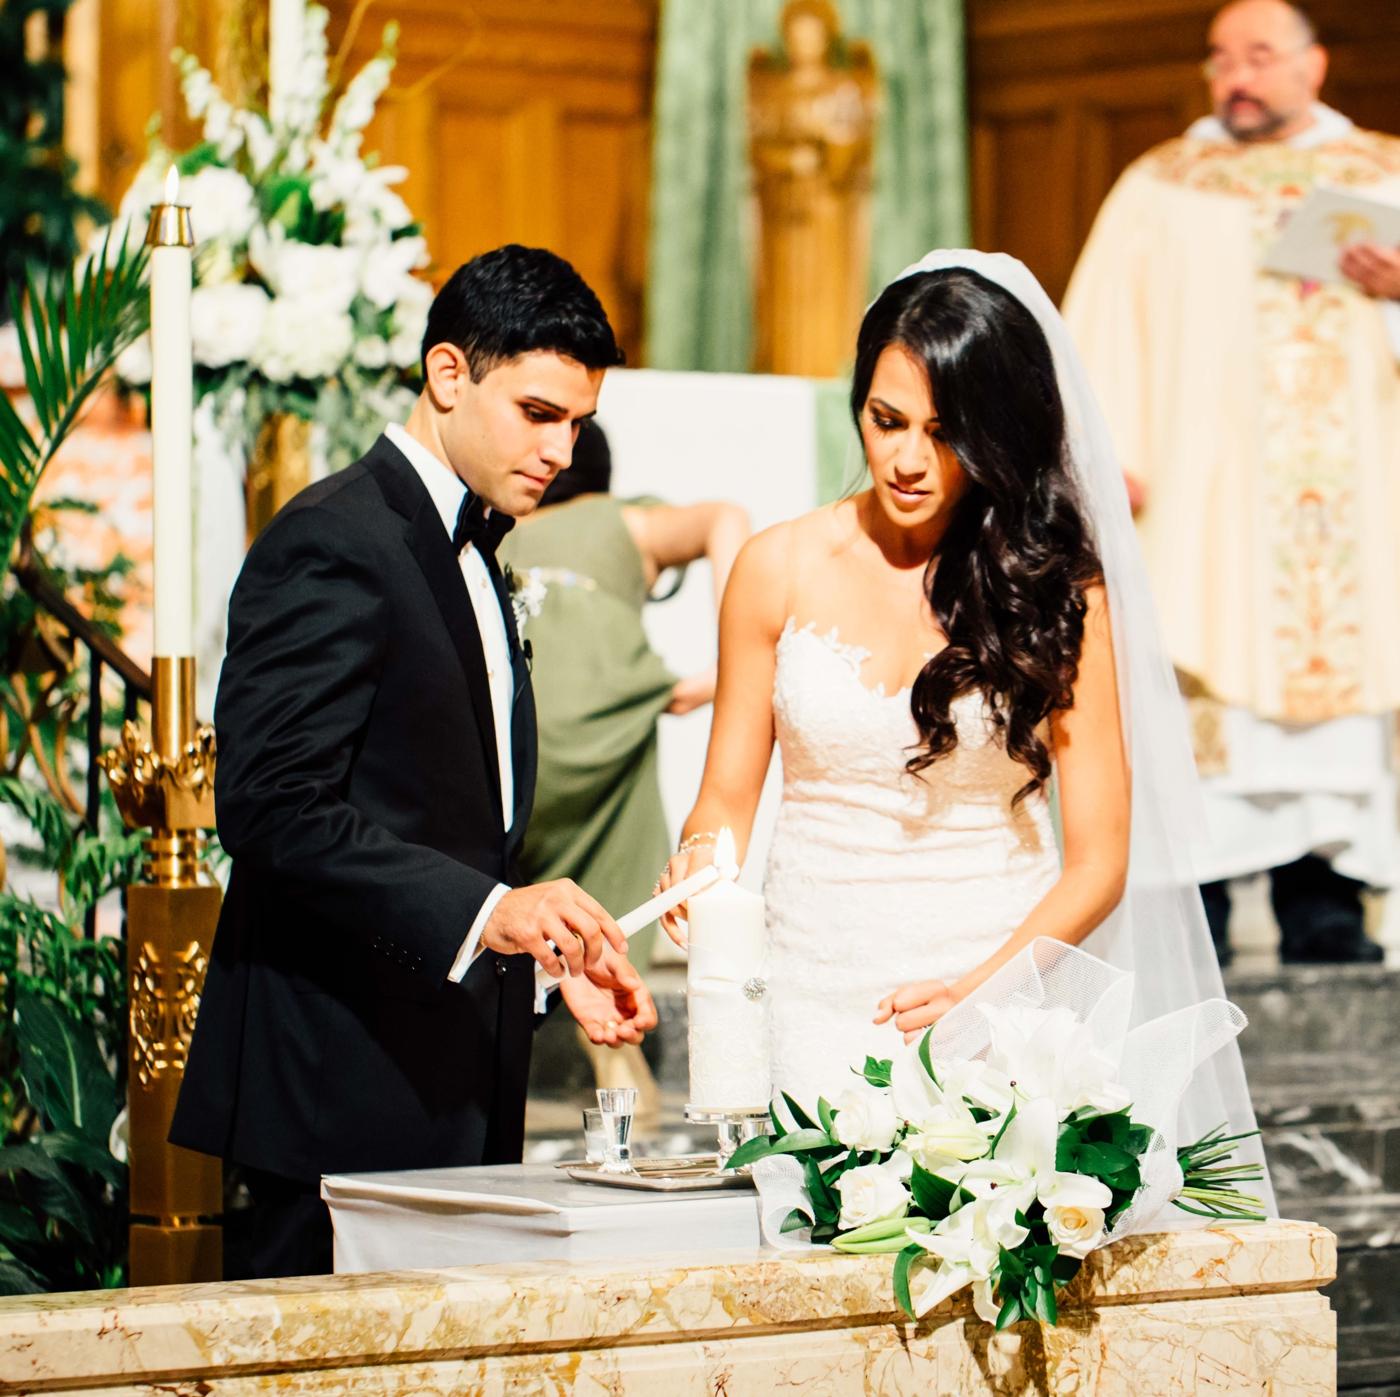 chicago-fine-art-wedding-photography-alfano6